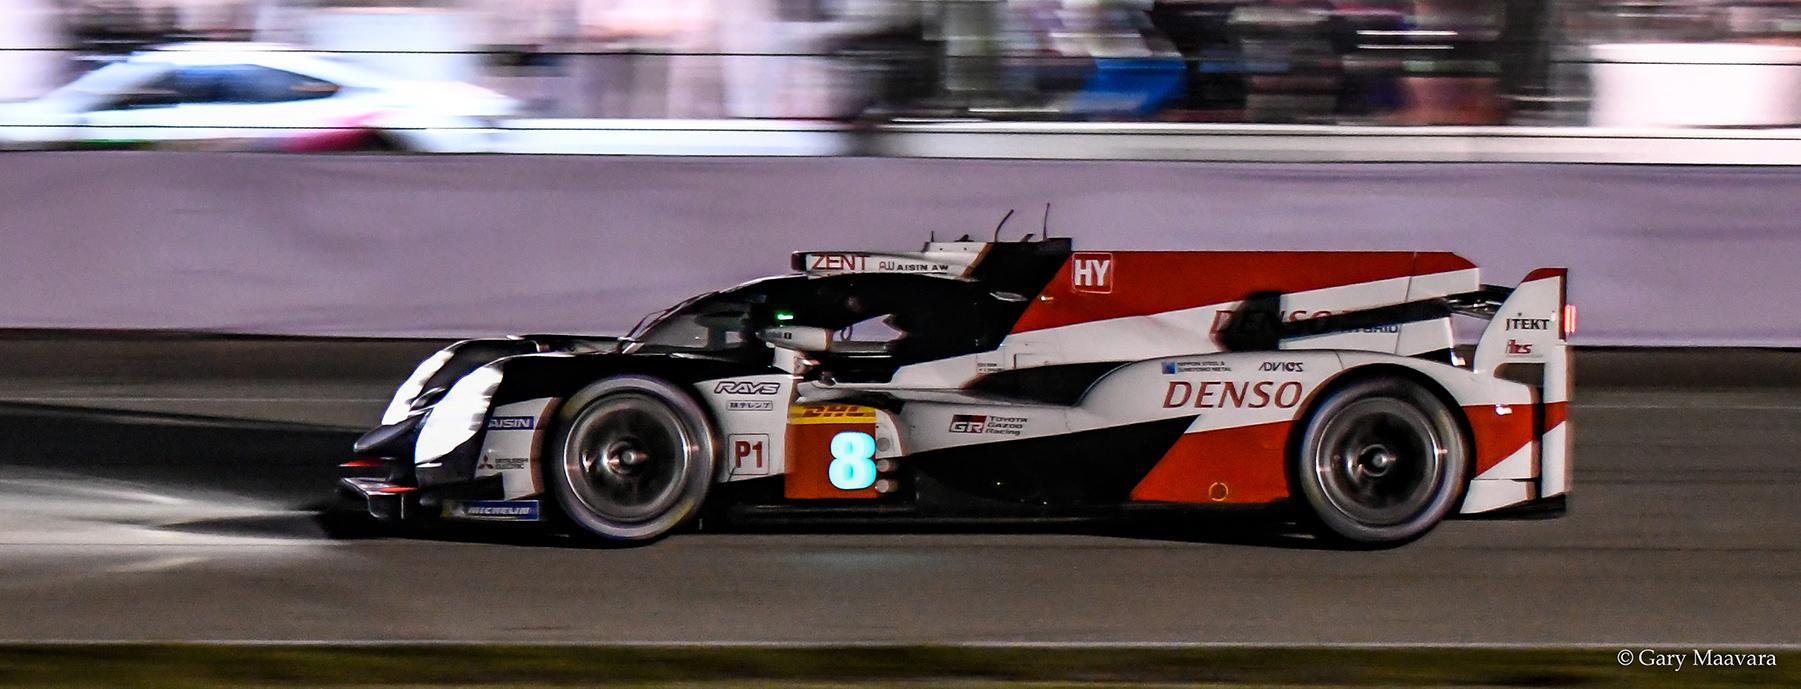 TrackWorthy - WEC qualifying_#8_ #8 Toyota Gazoo Racing Toyota TS050 Hybrid (Alonso-Buemi-Nakajima)_pole